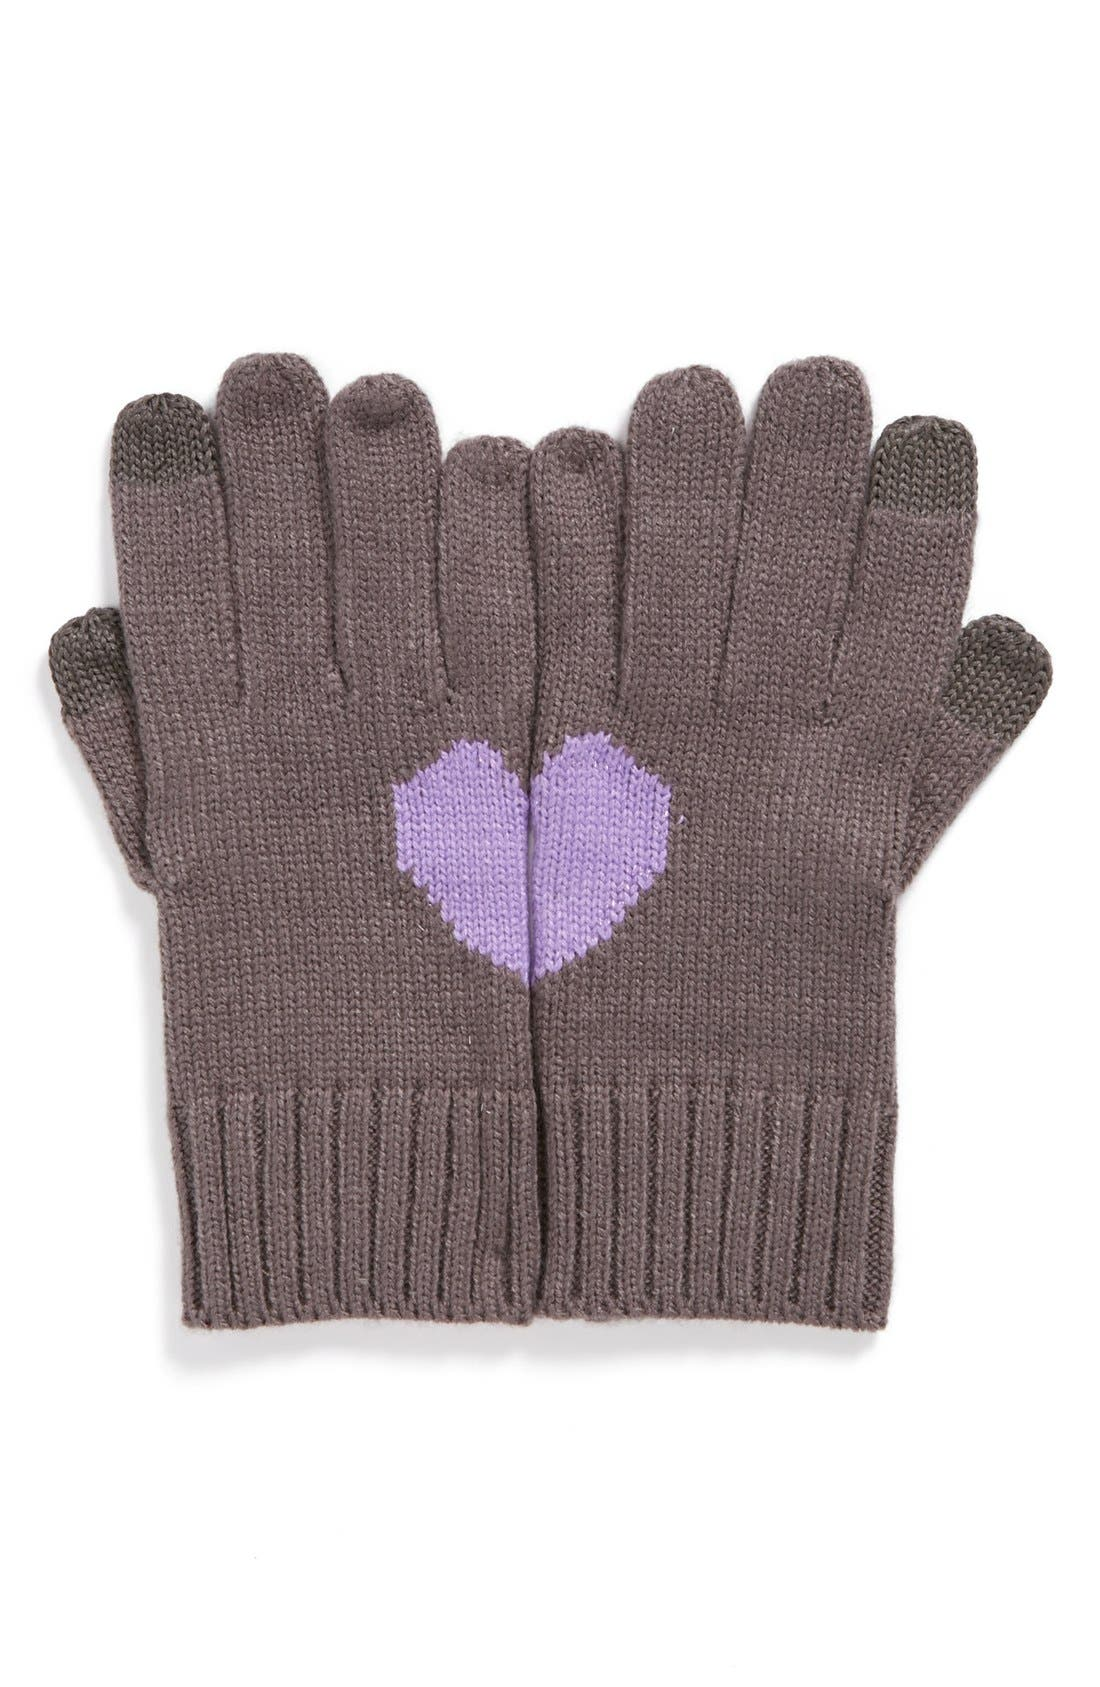 Main Image - BCBGeneration 'Love' Gloves